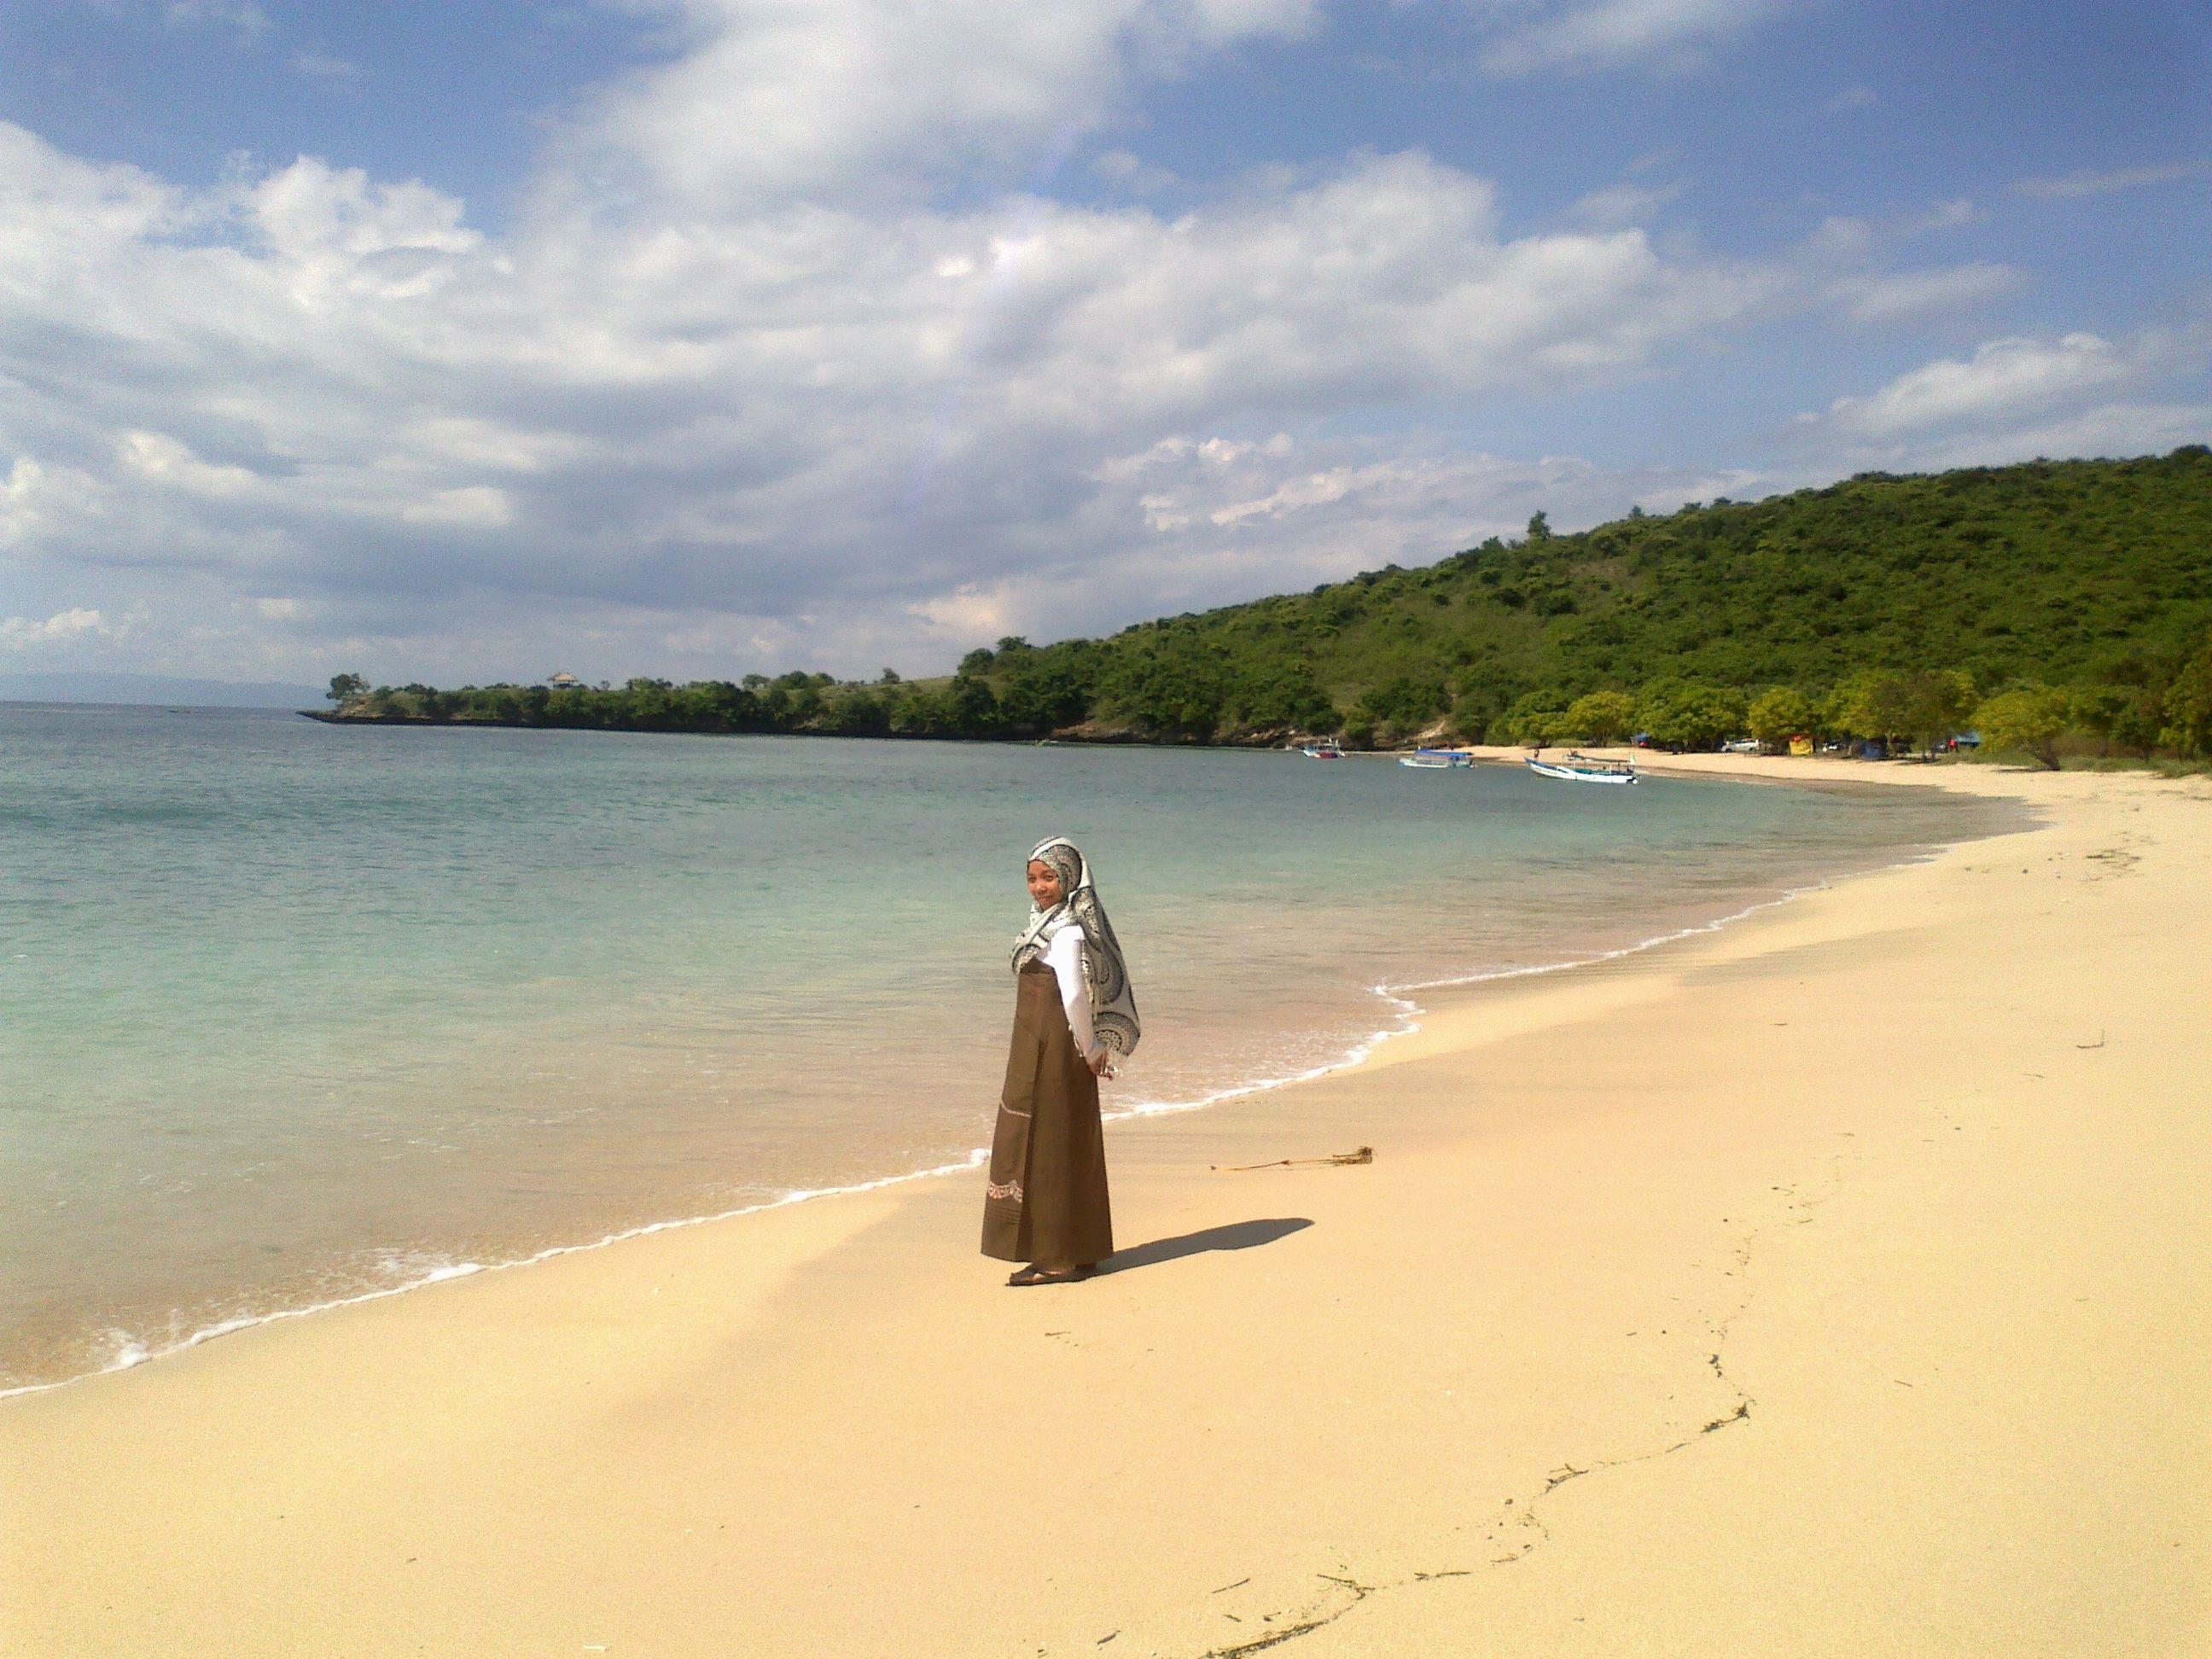 Pantai Pink Terletak Kecamatan Jerowaru Kabupaten Lombok Timur Pasirnya Berwarna